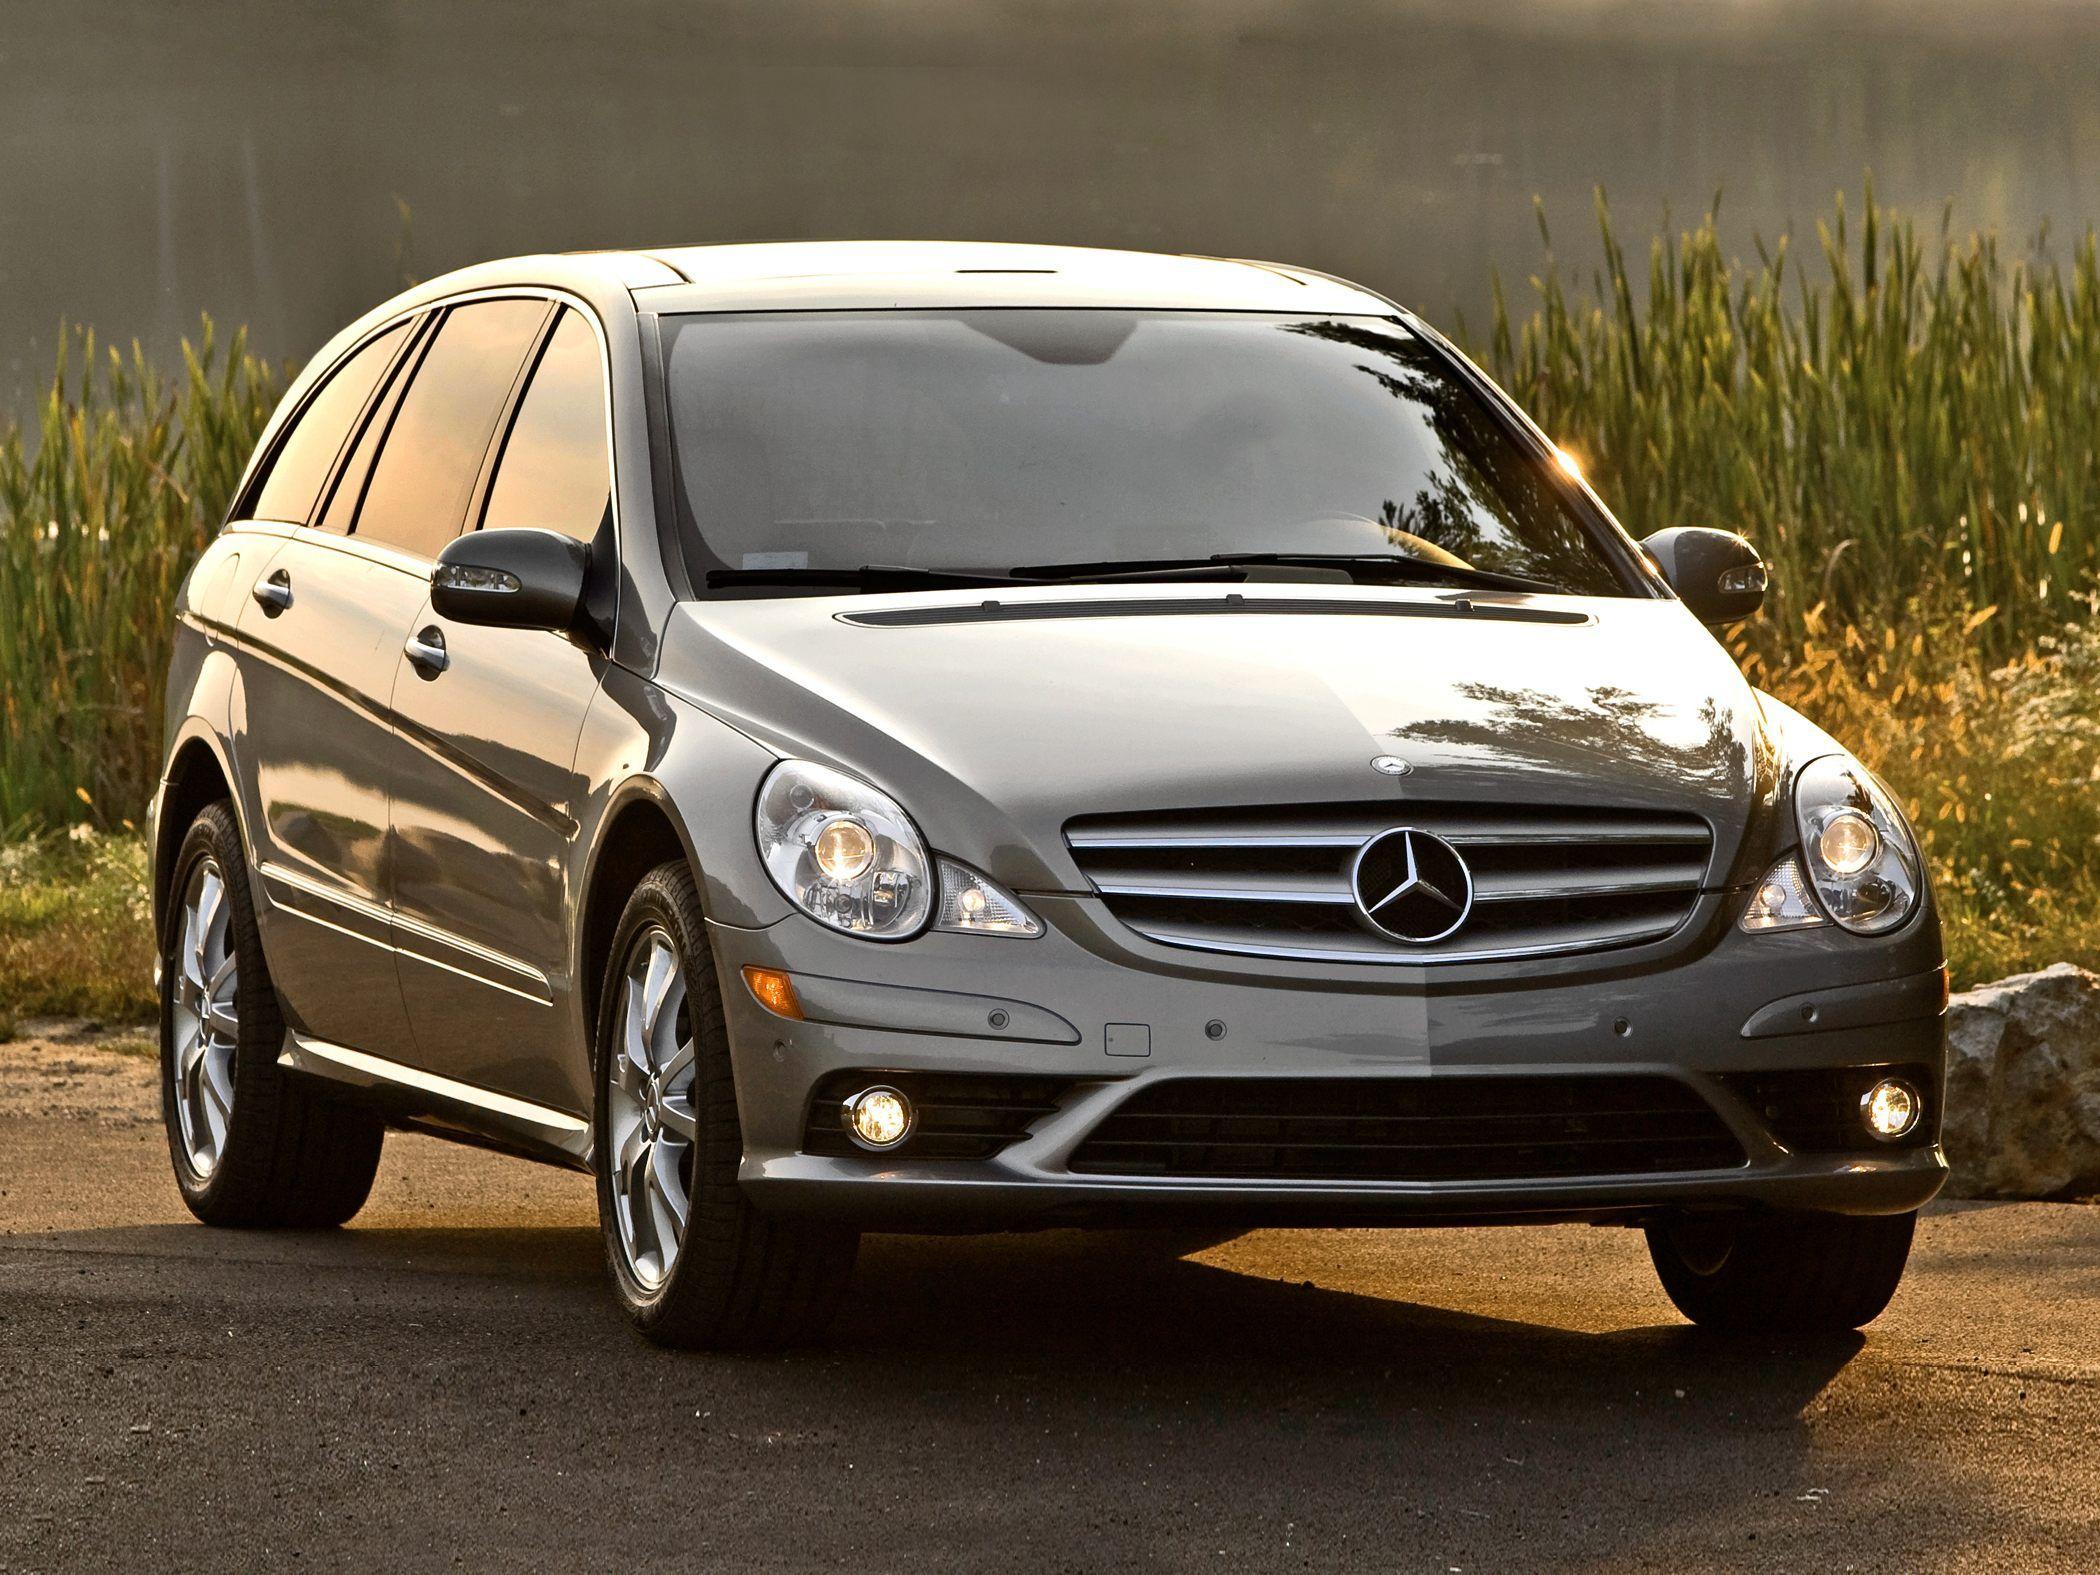 2010 MercedesBenz RClass Price, Photos, Reviews